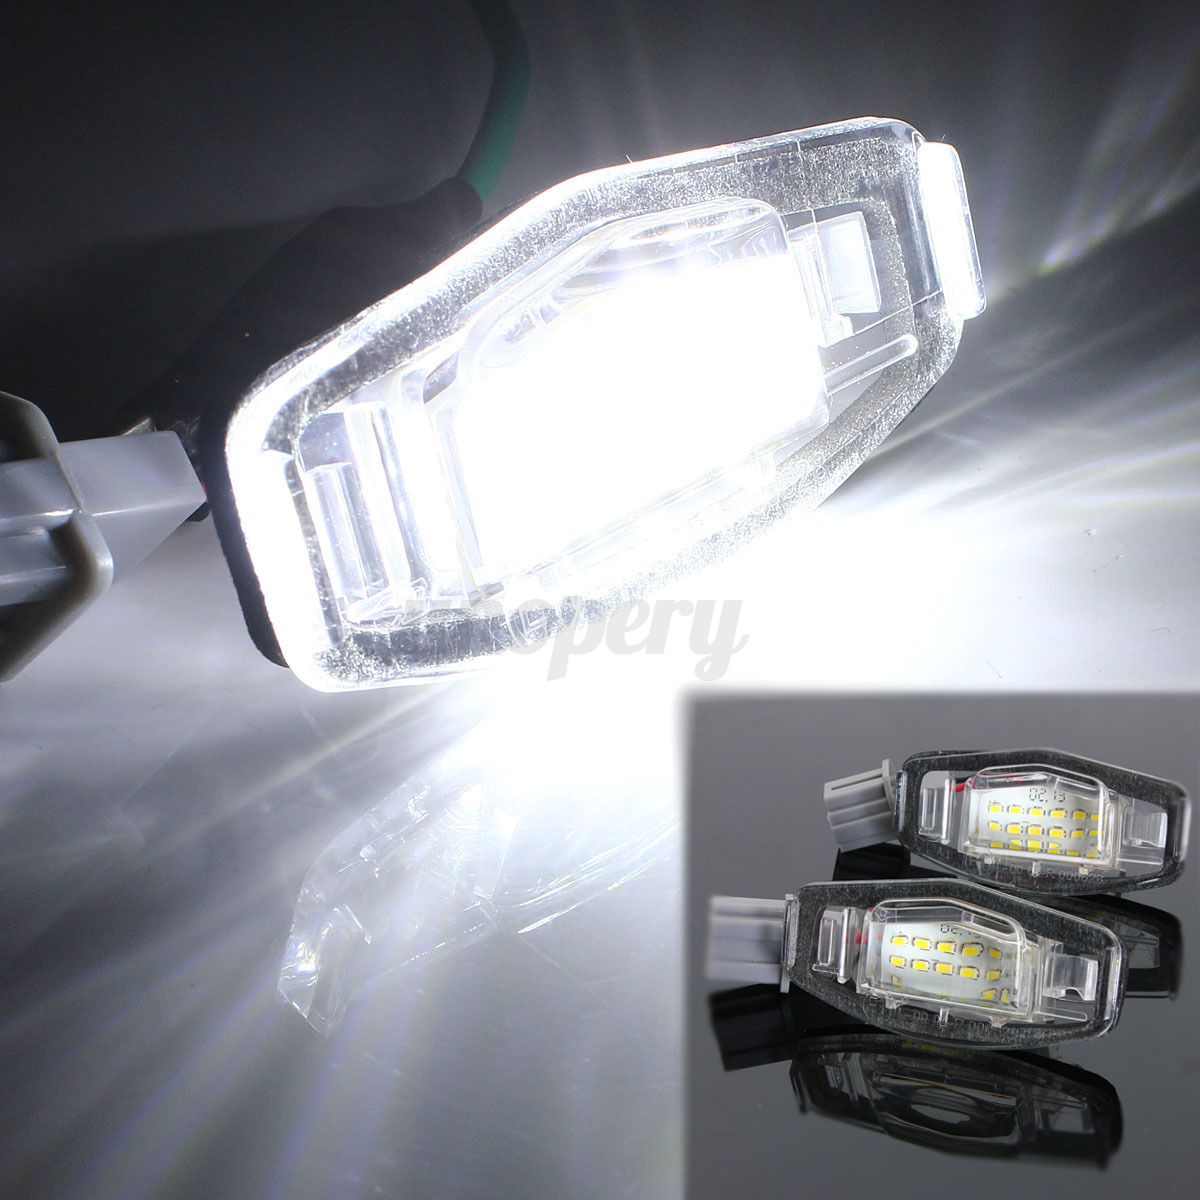 2001 Acura Tl 3 2 >> 2x LED License Plate Light For Acura TL TSX MDX Honda ...